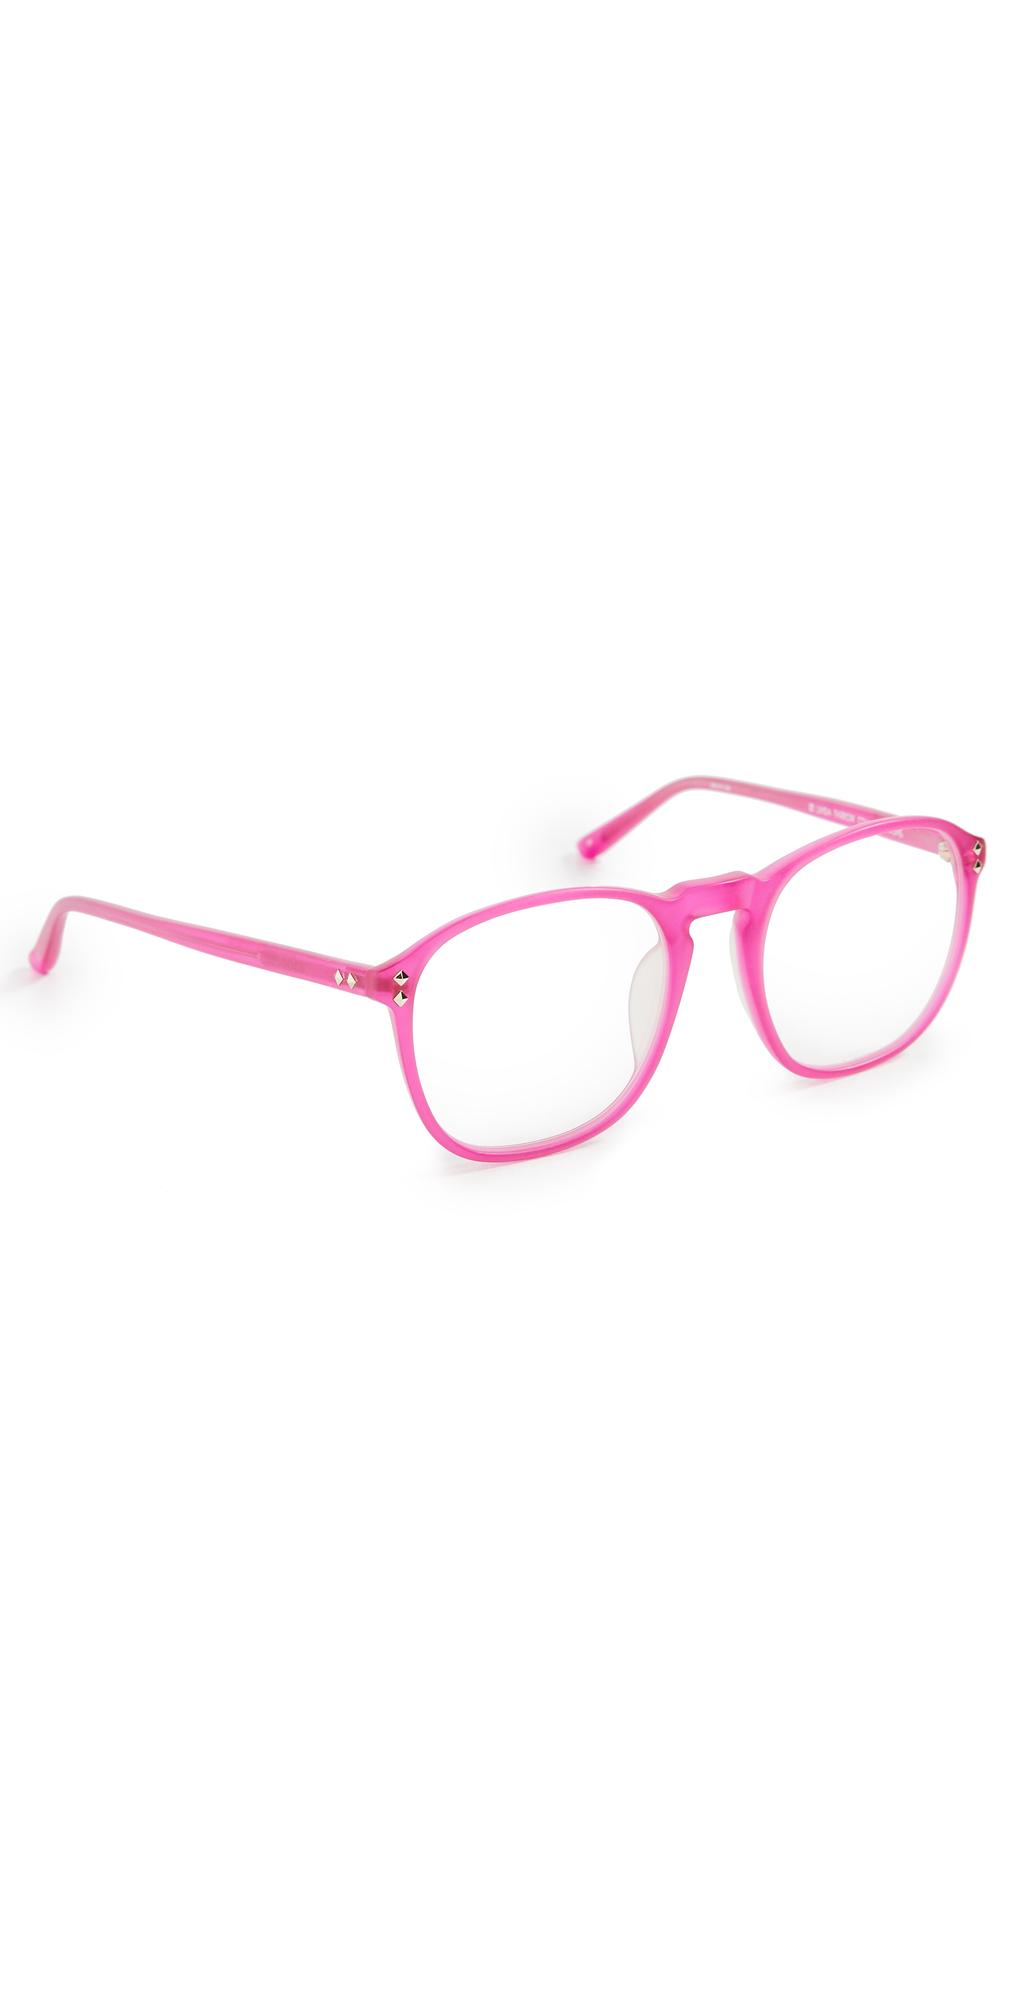 x Matthew Williamson Oversized Glasses